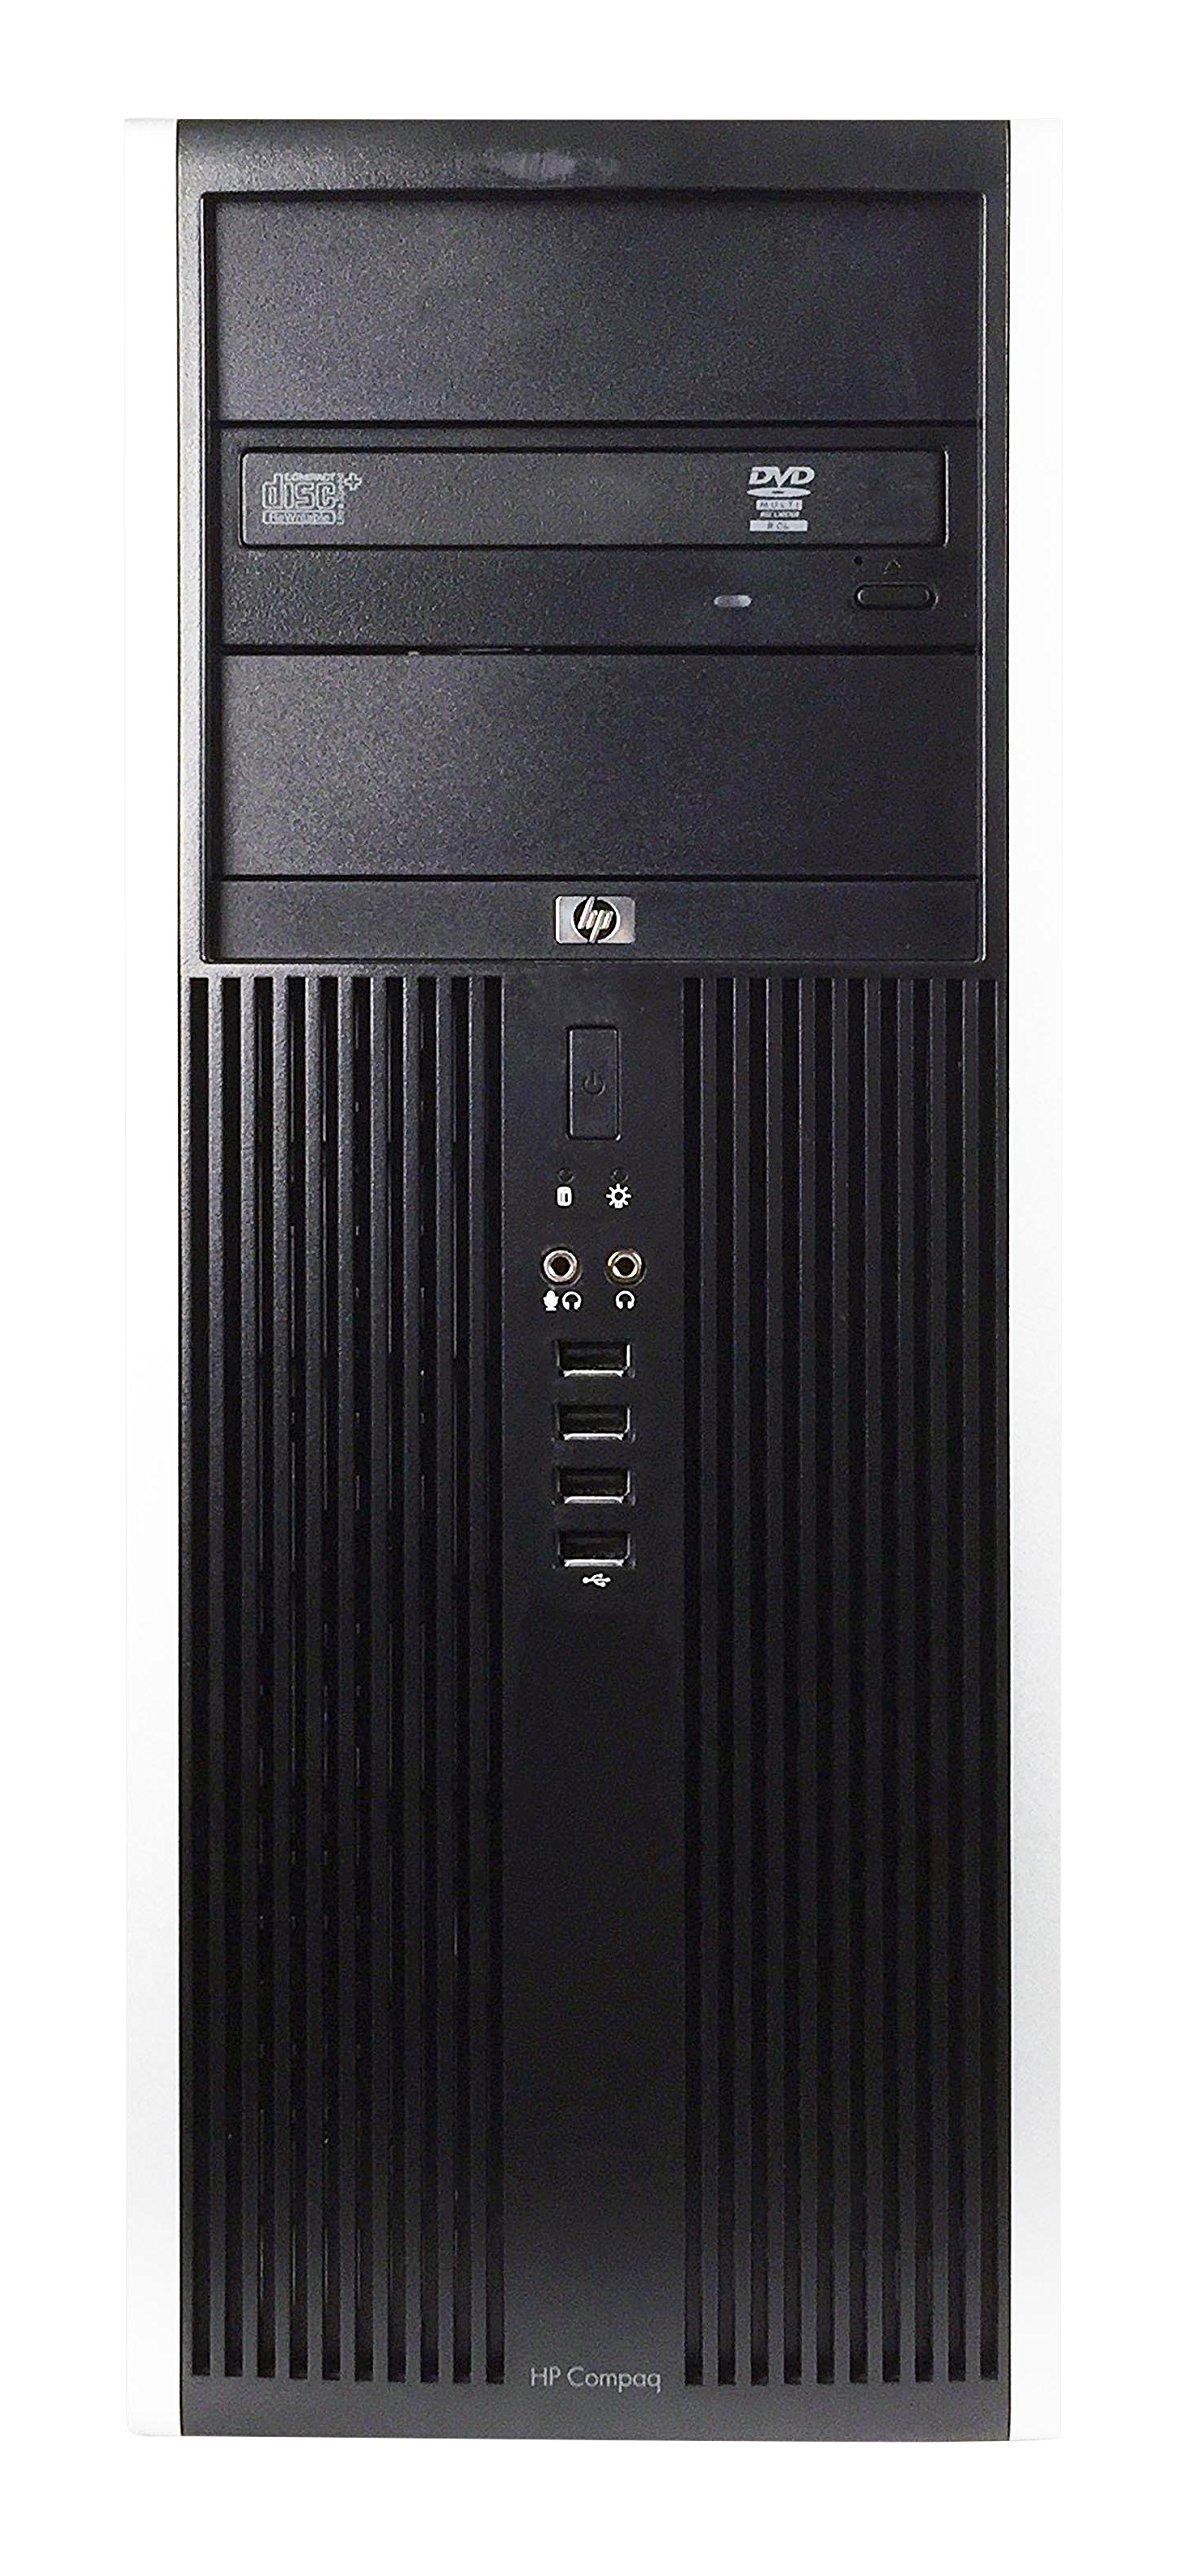 HP 8100 Business High Performance Tower Desktop Computer PC (Intel Core i5 650 3.2G,4G DDR3,250G,DVD,Windows 10 Professional) - Black/Silver - 16VFHPDT0514